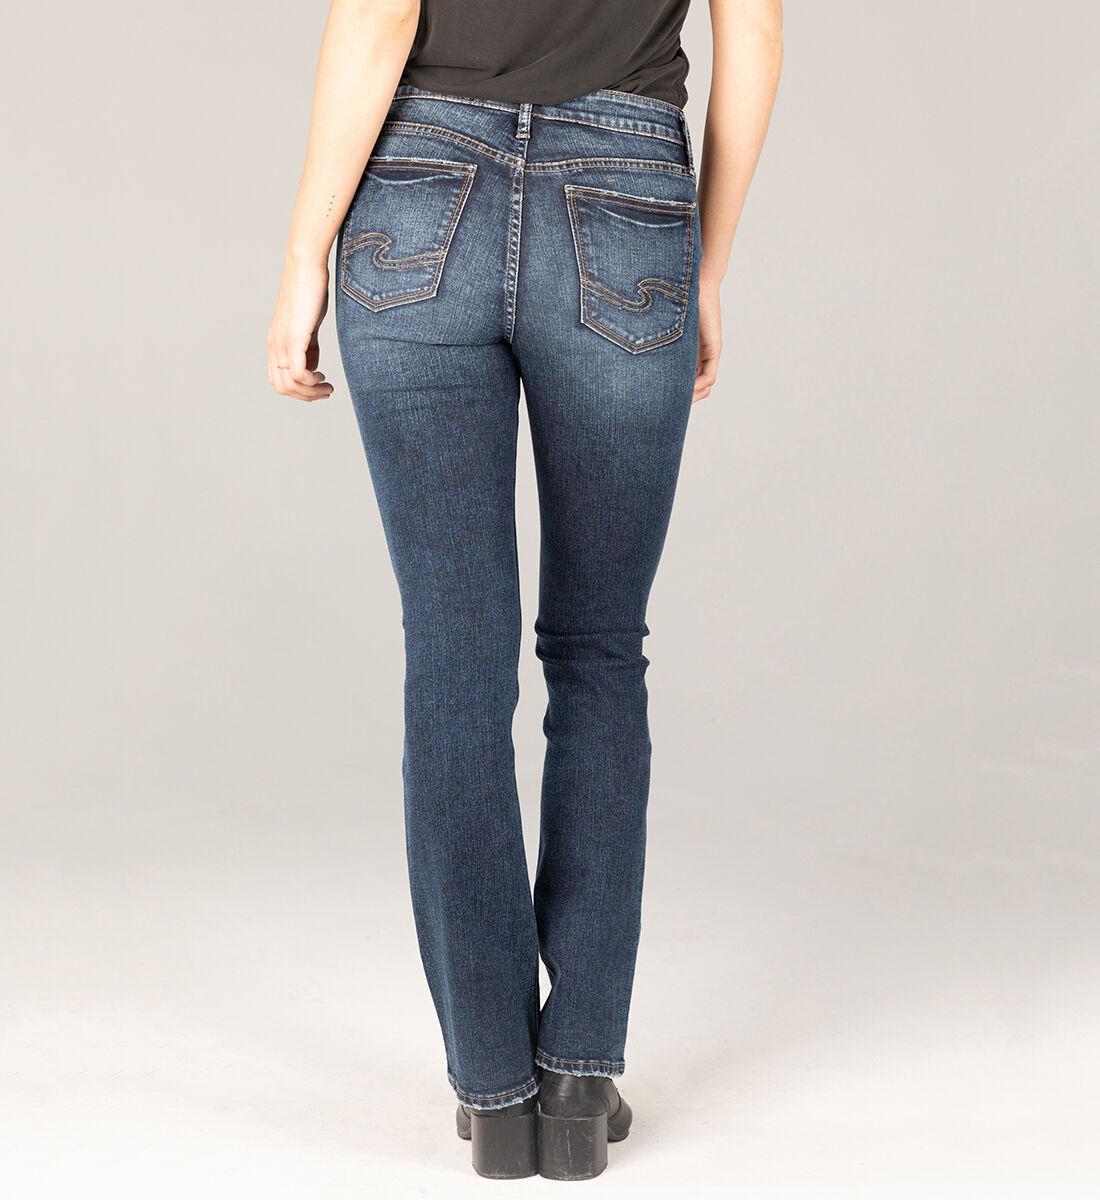 Elyse Mid Rise Slim Bootcut Jeans Back